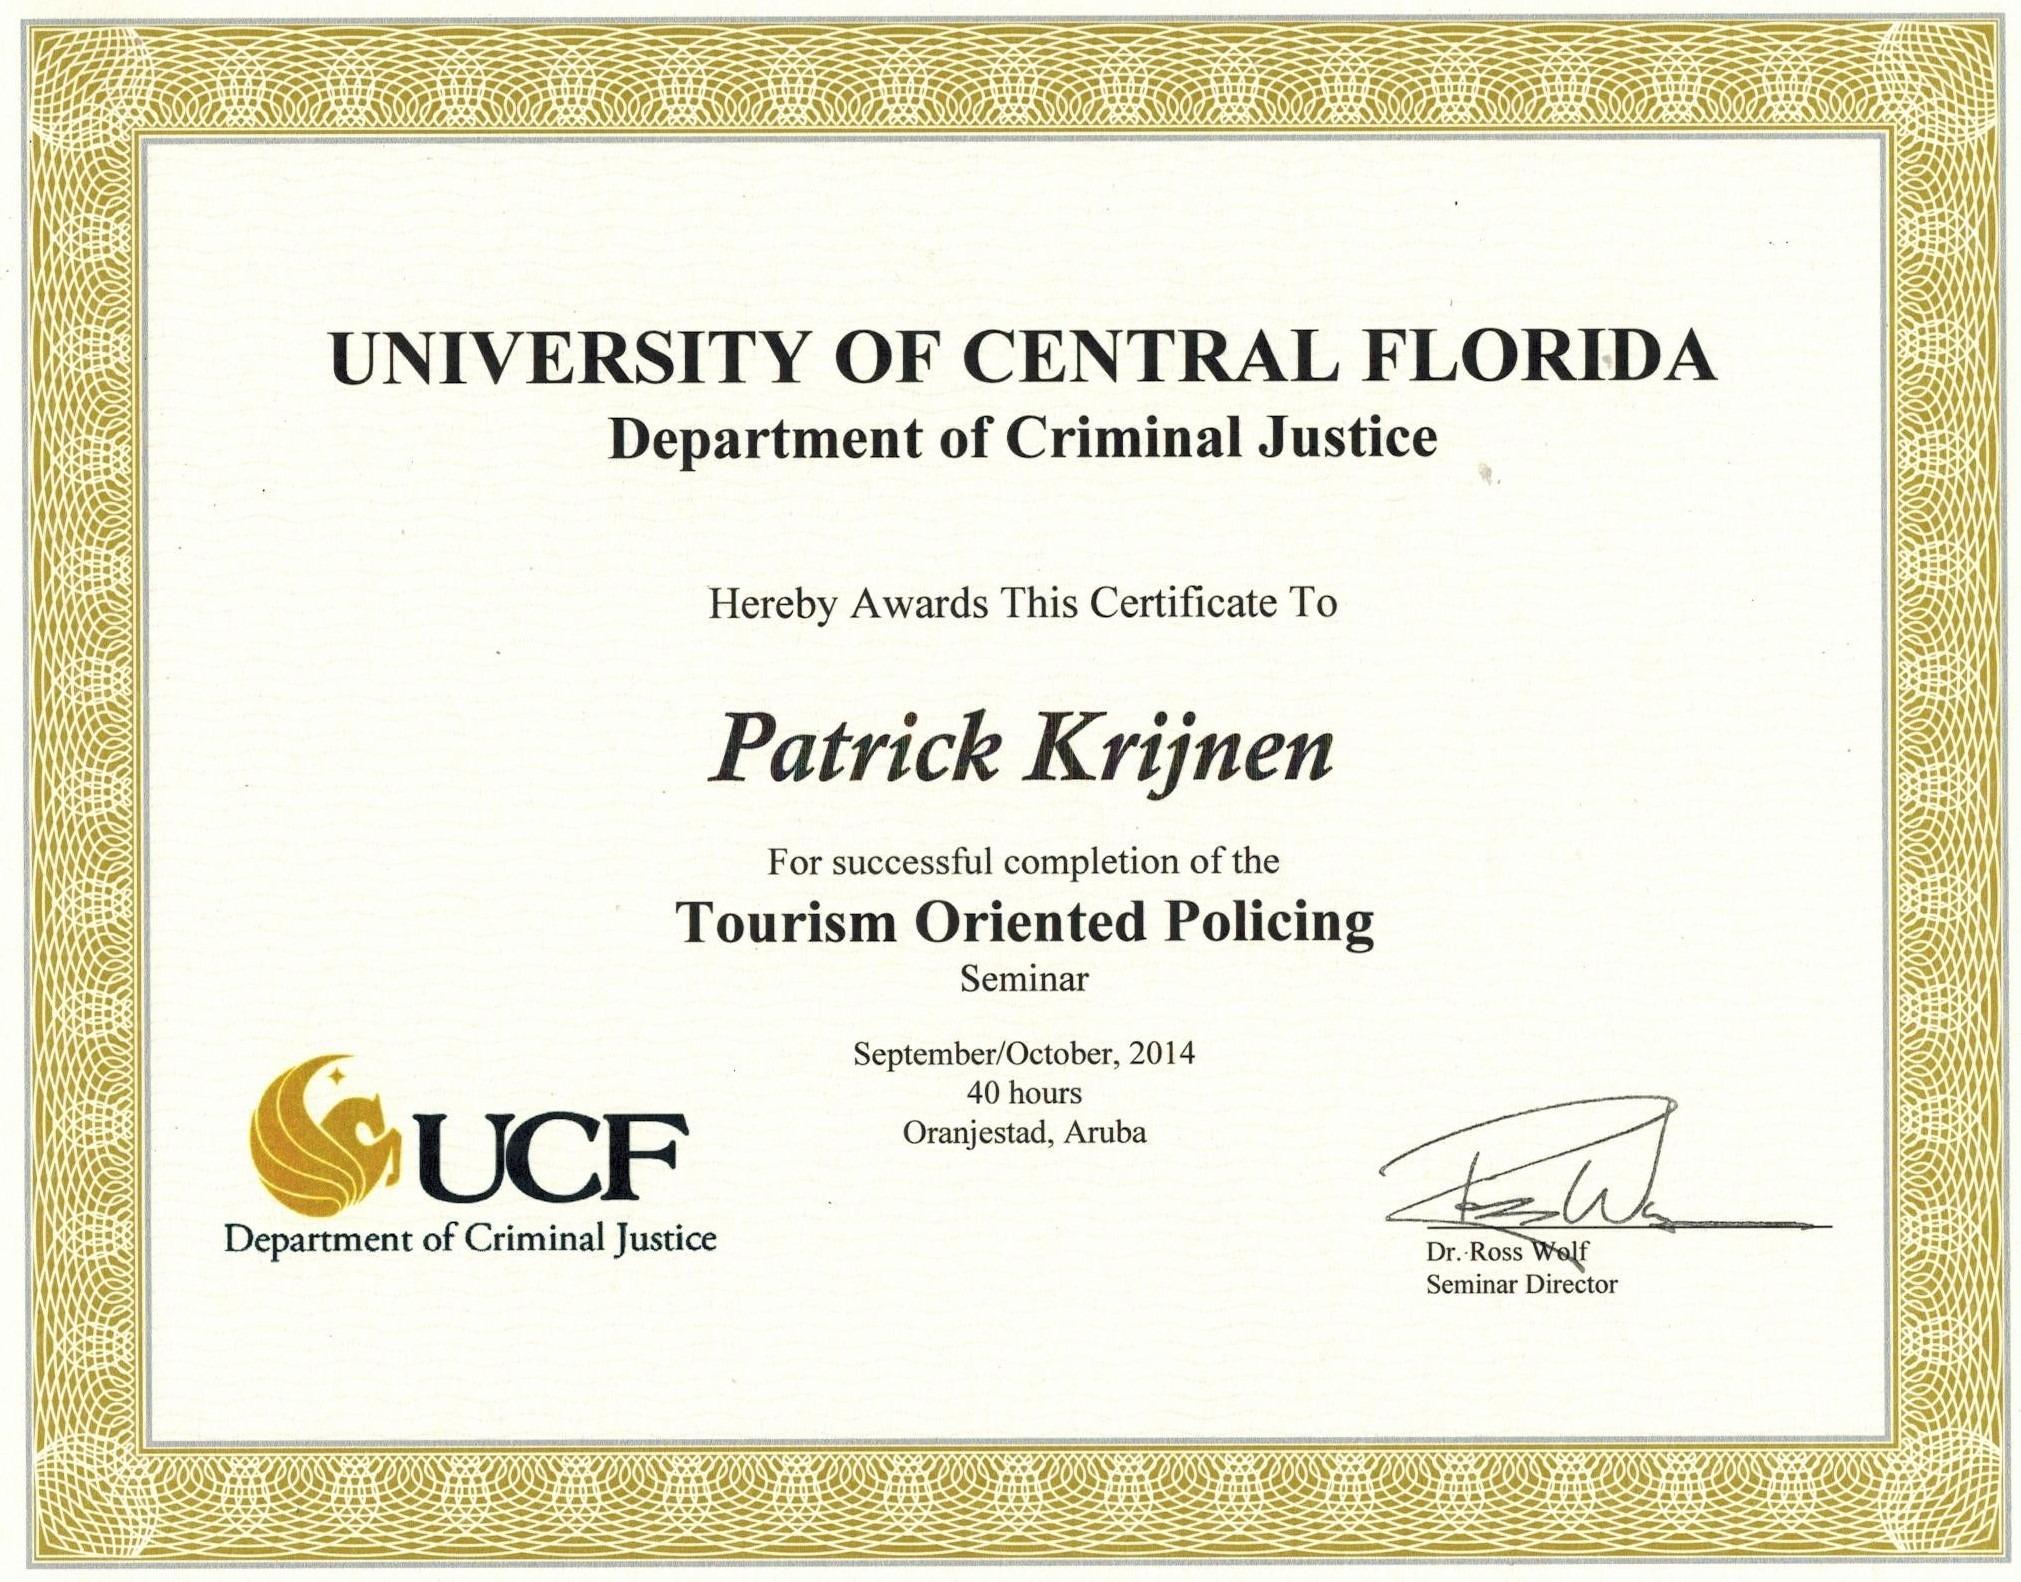 Patrick krijnen bayt tourism oriented policing seminar certificate xflitez Images